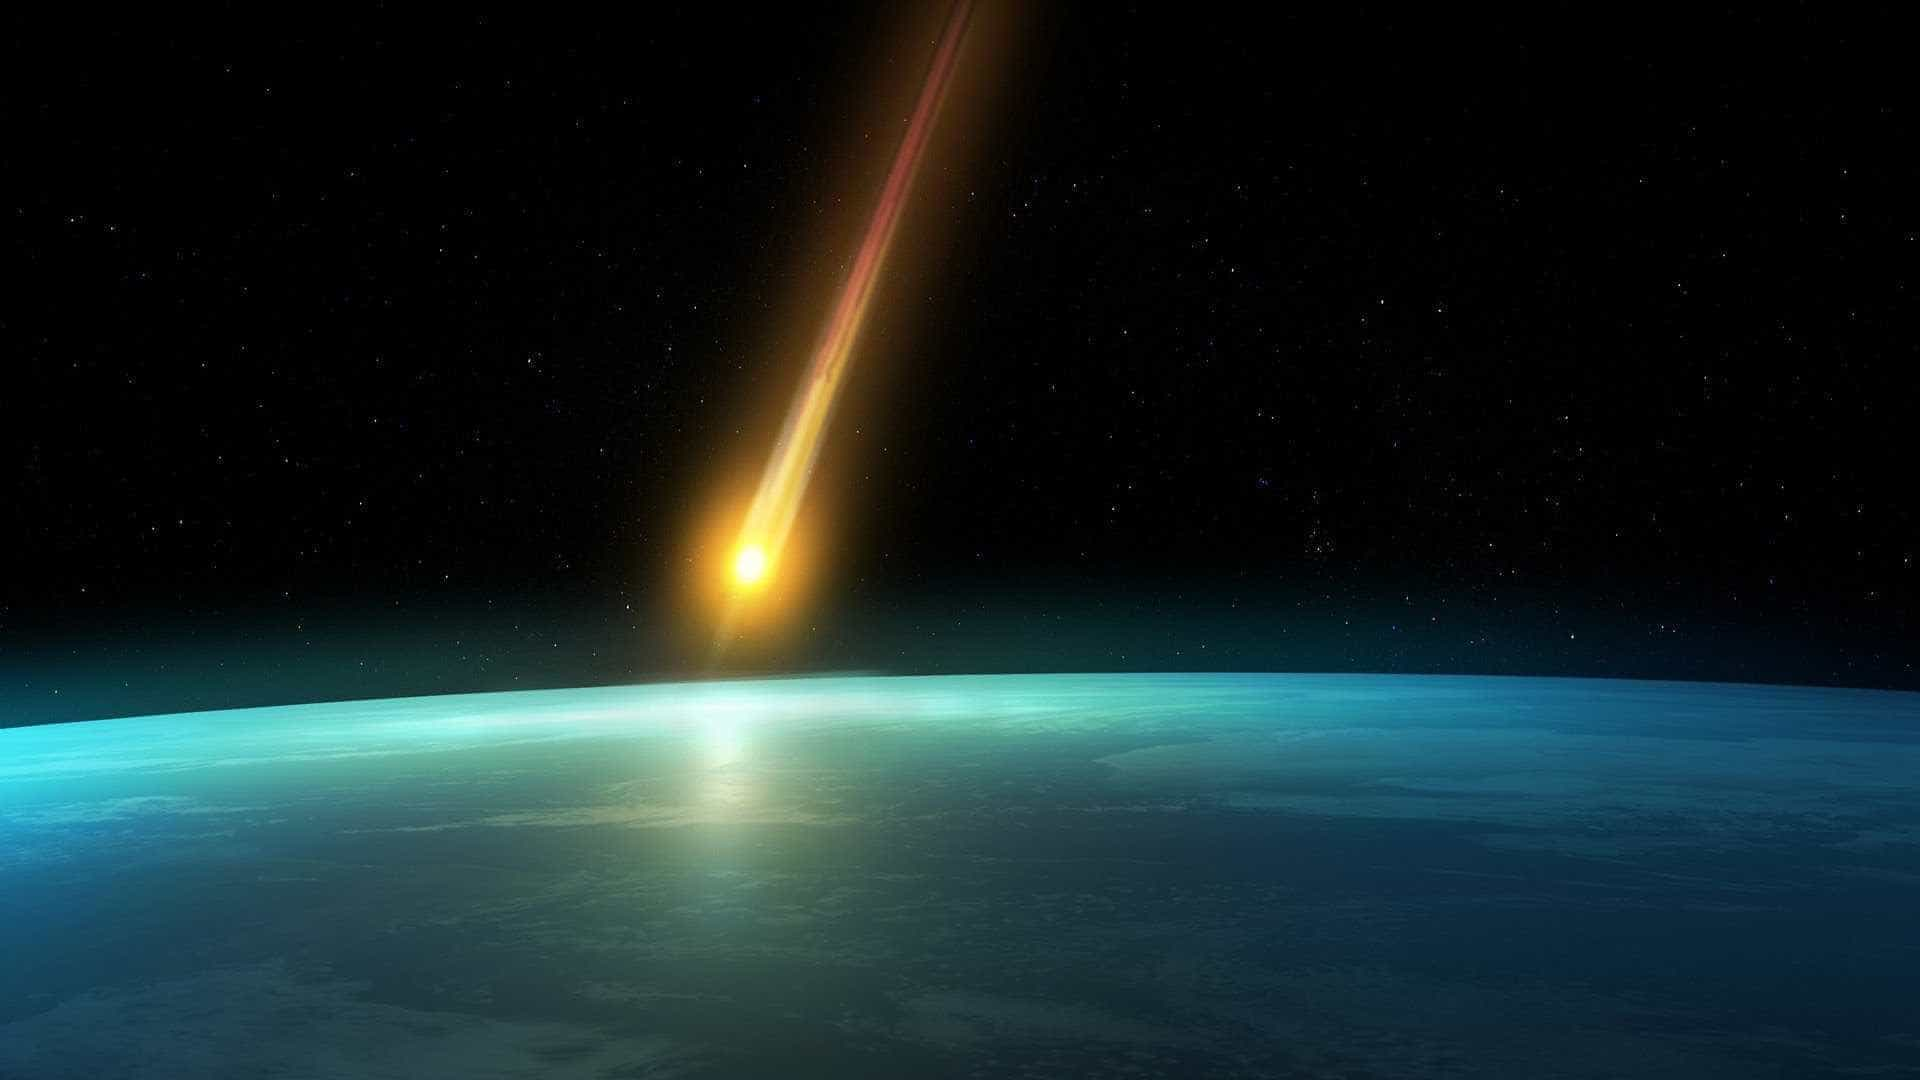 NASA se pronuncia sobre 'bola de fogo' que cortou o céu da Flórida